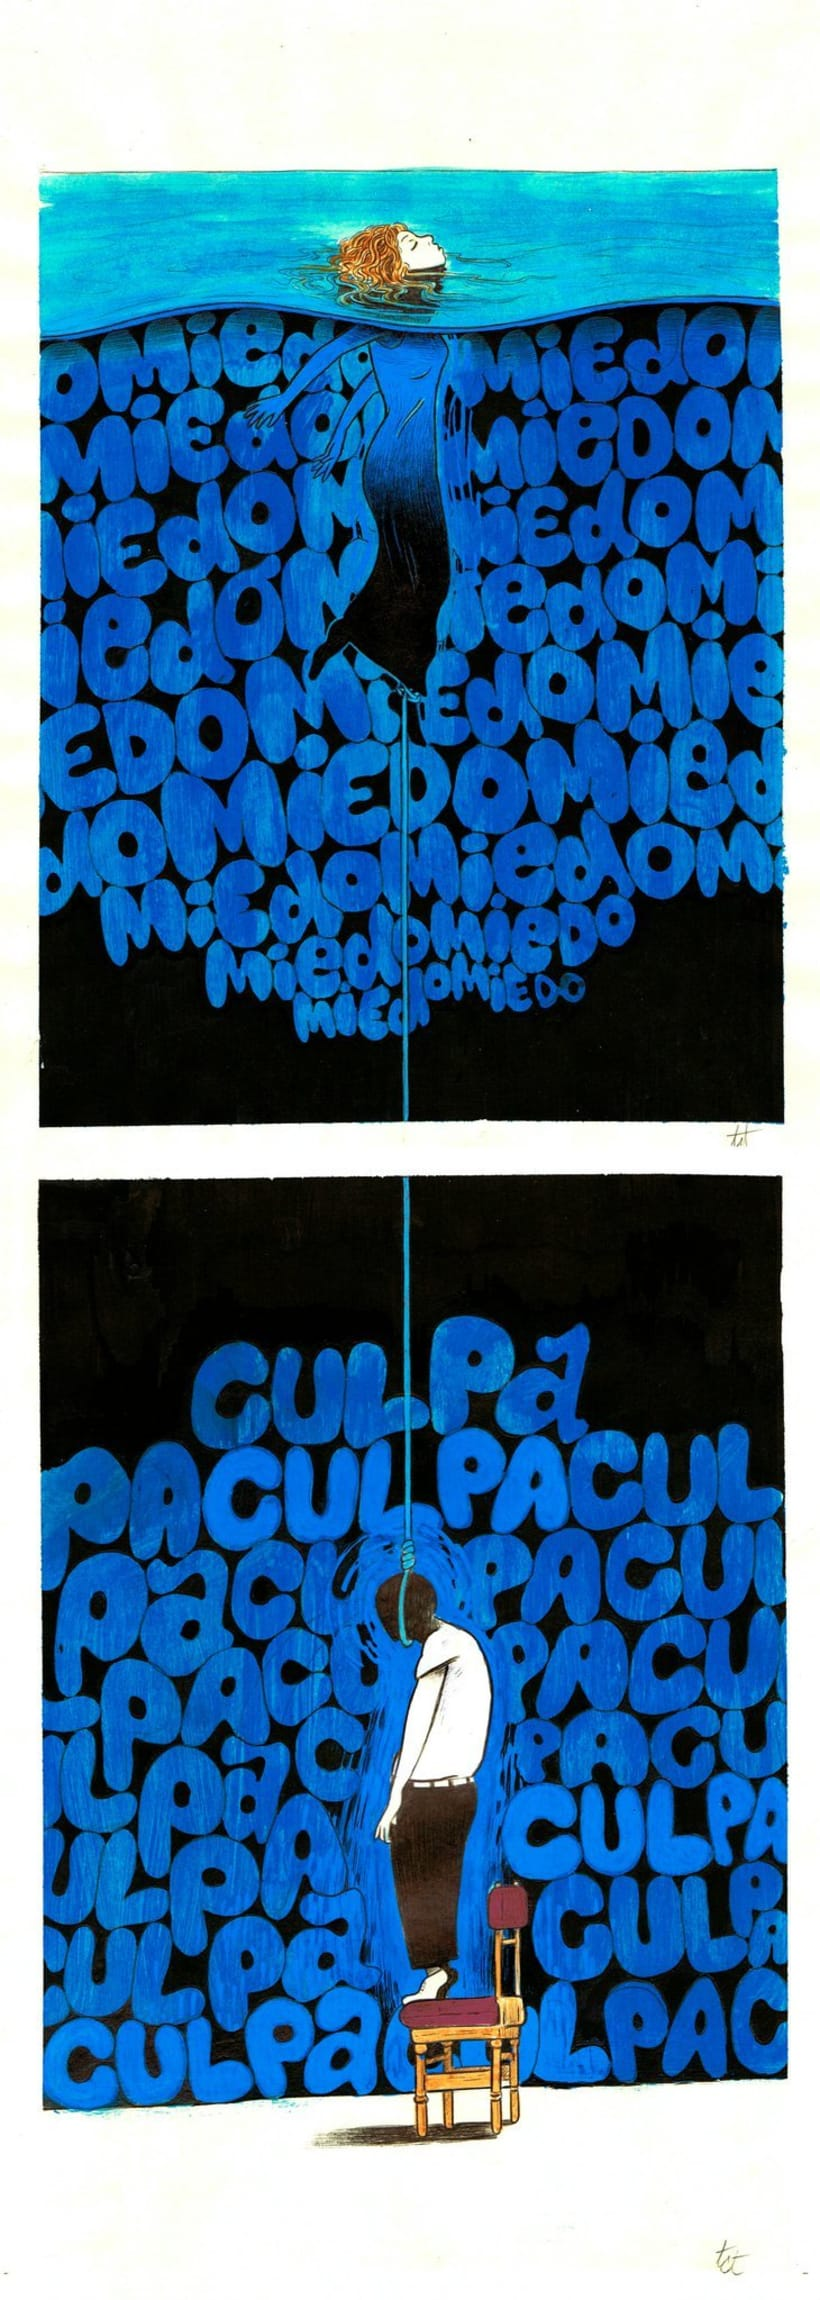 """Critic-arte"" Exposicion colectiva  1"